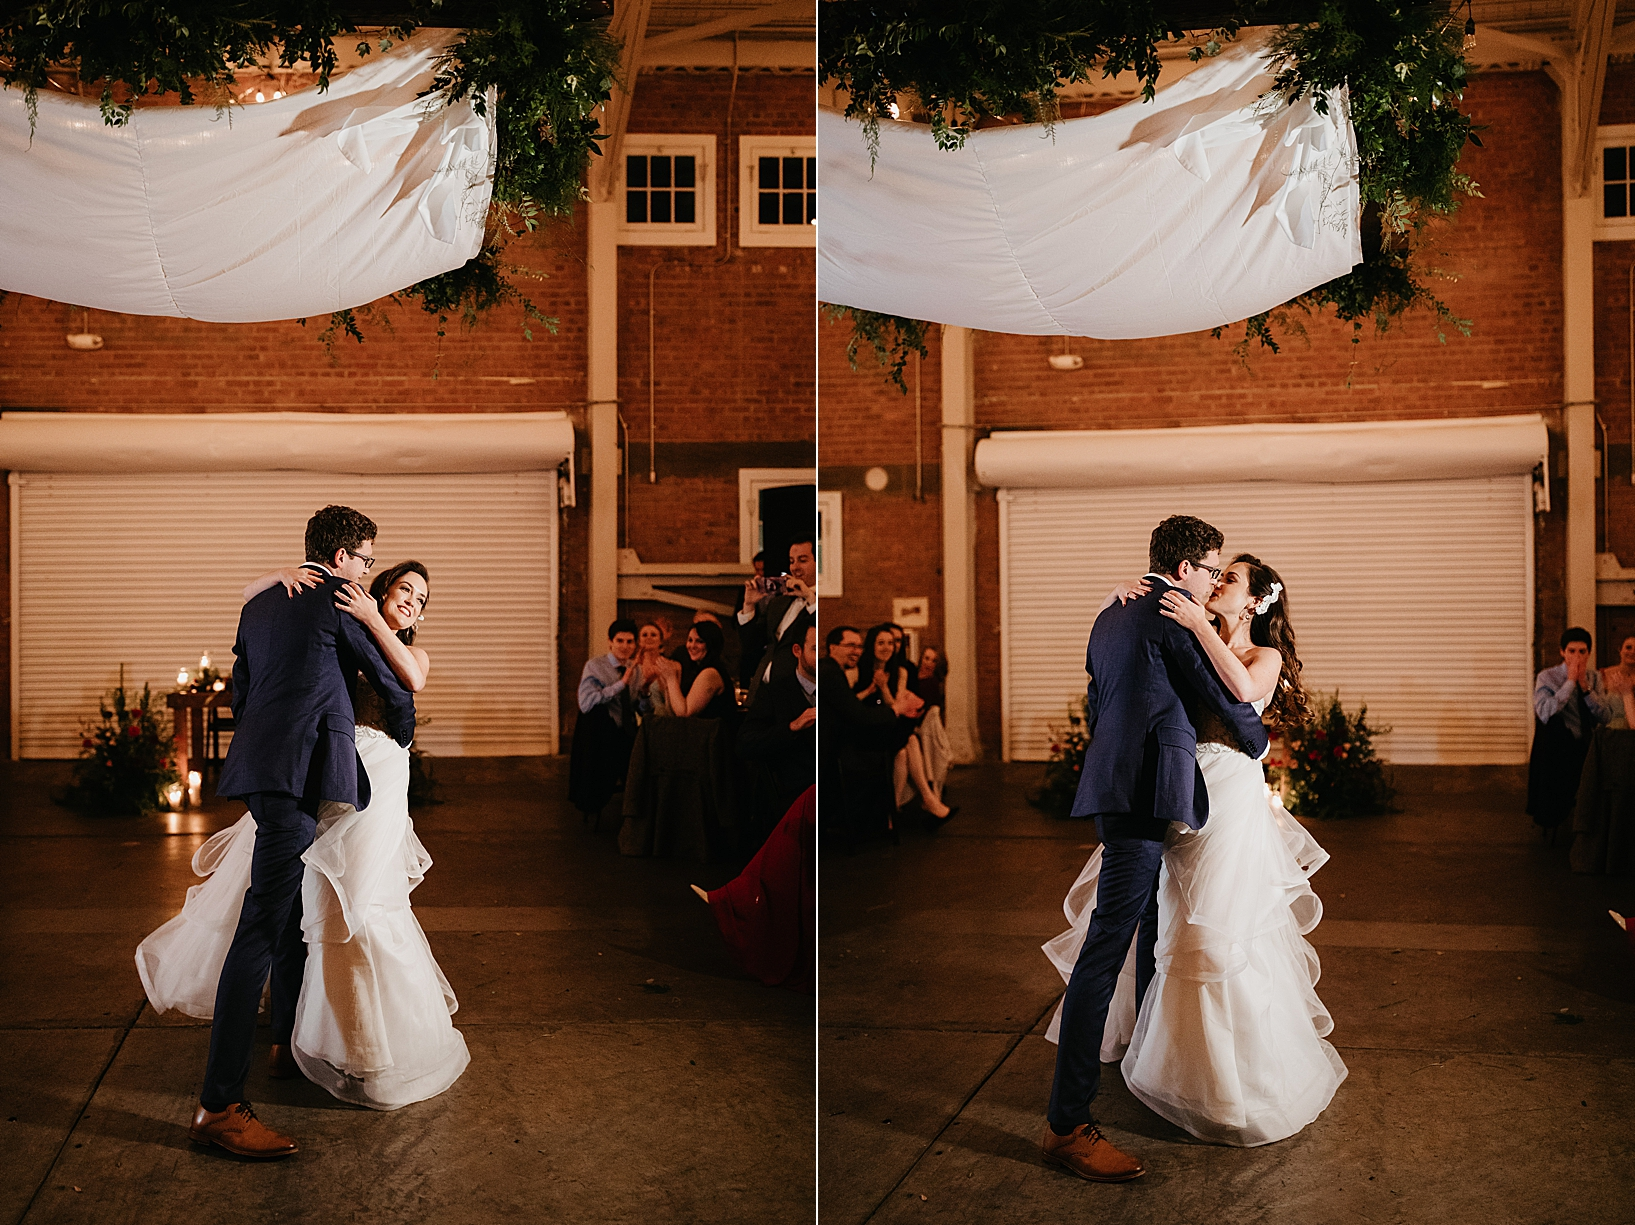 Brick-San-Diego-Winter-Wedding-79.jpg